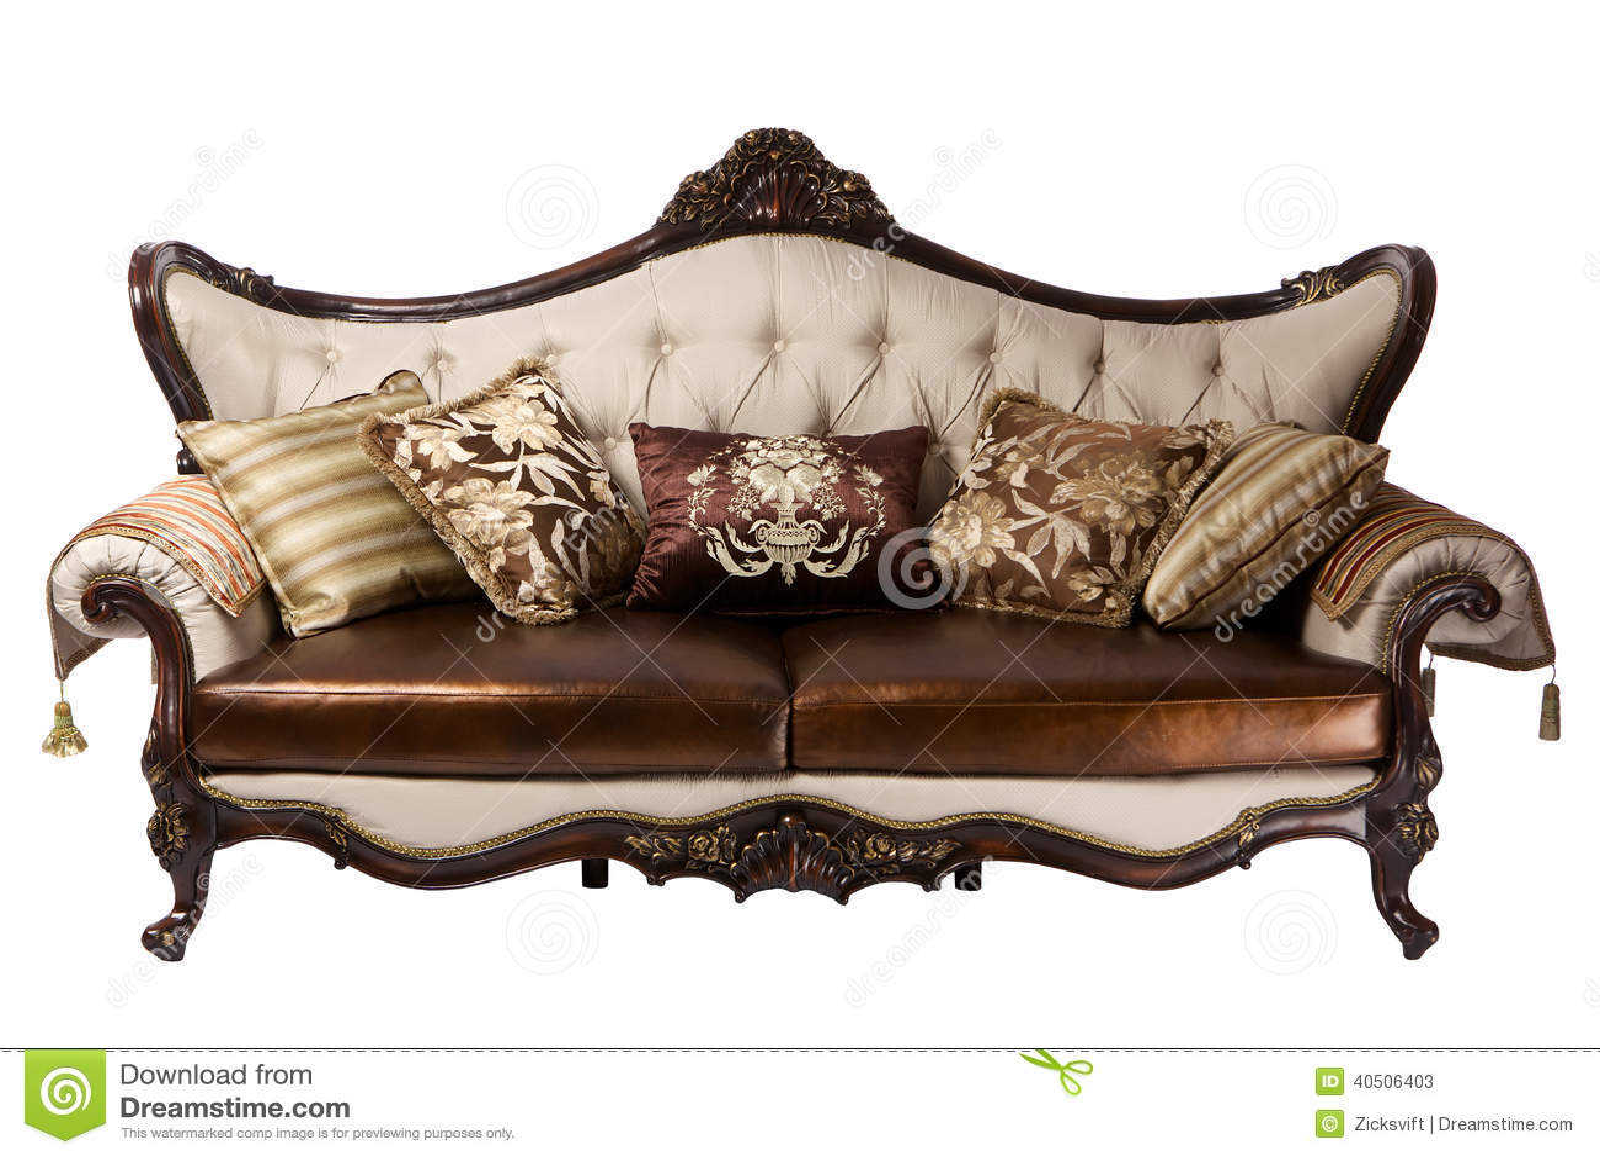 Leather divan stock photo image 40506403 for 0 25 divan saz teli